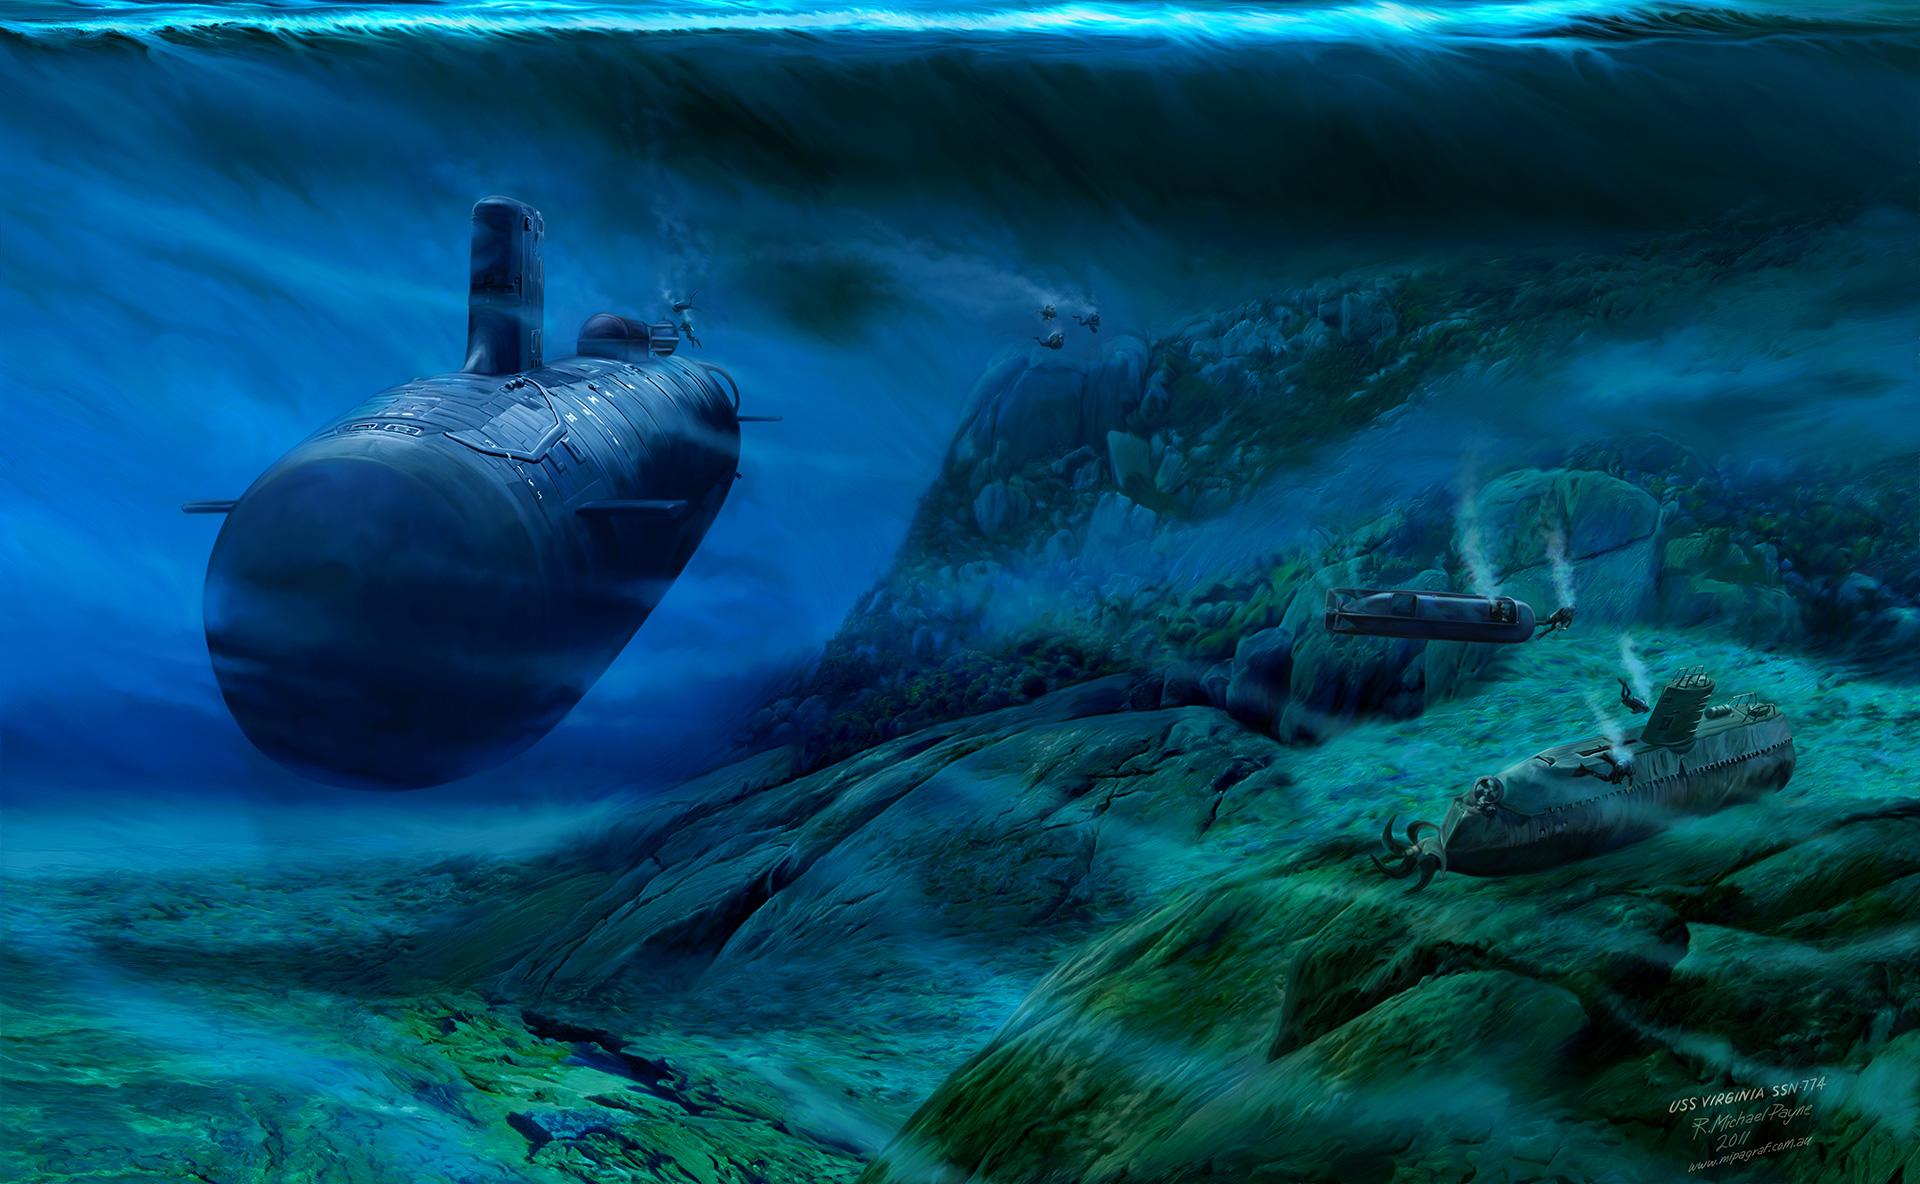 USS Virginia SSN 774